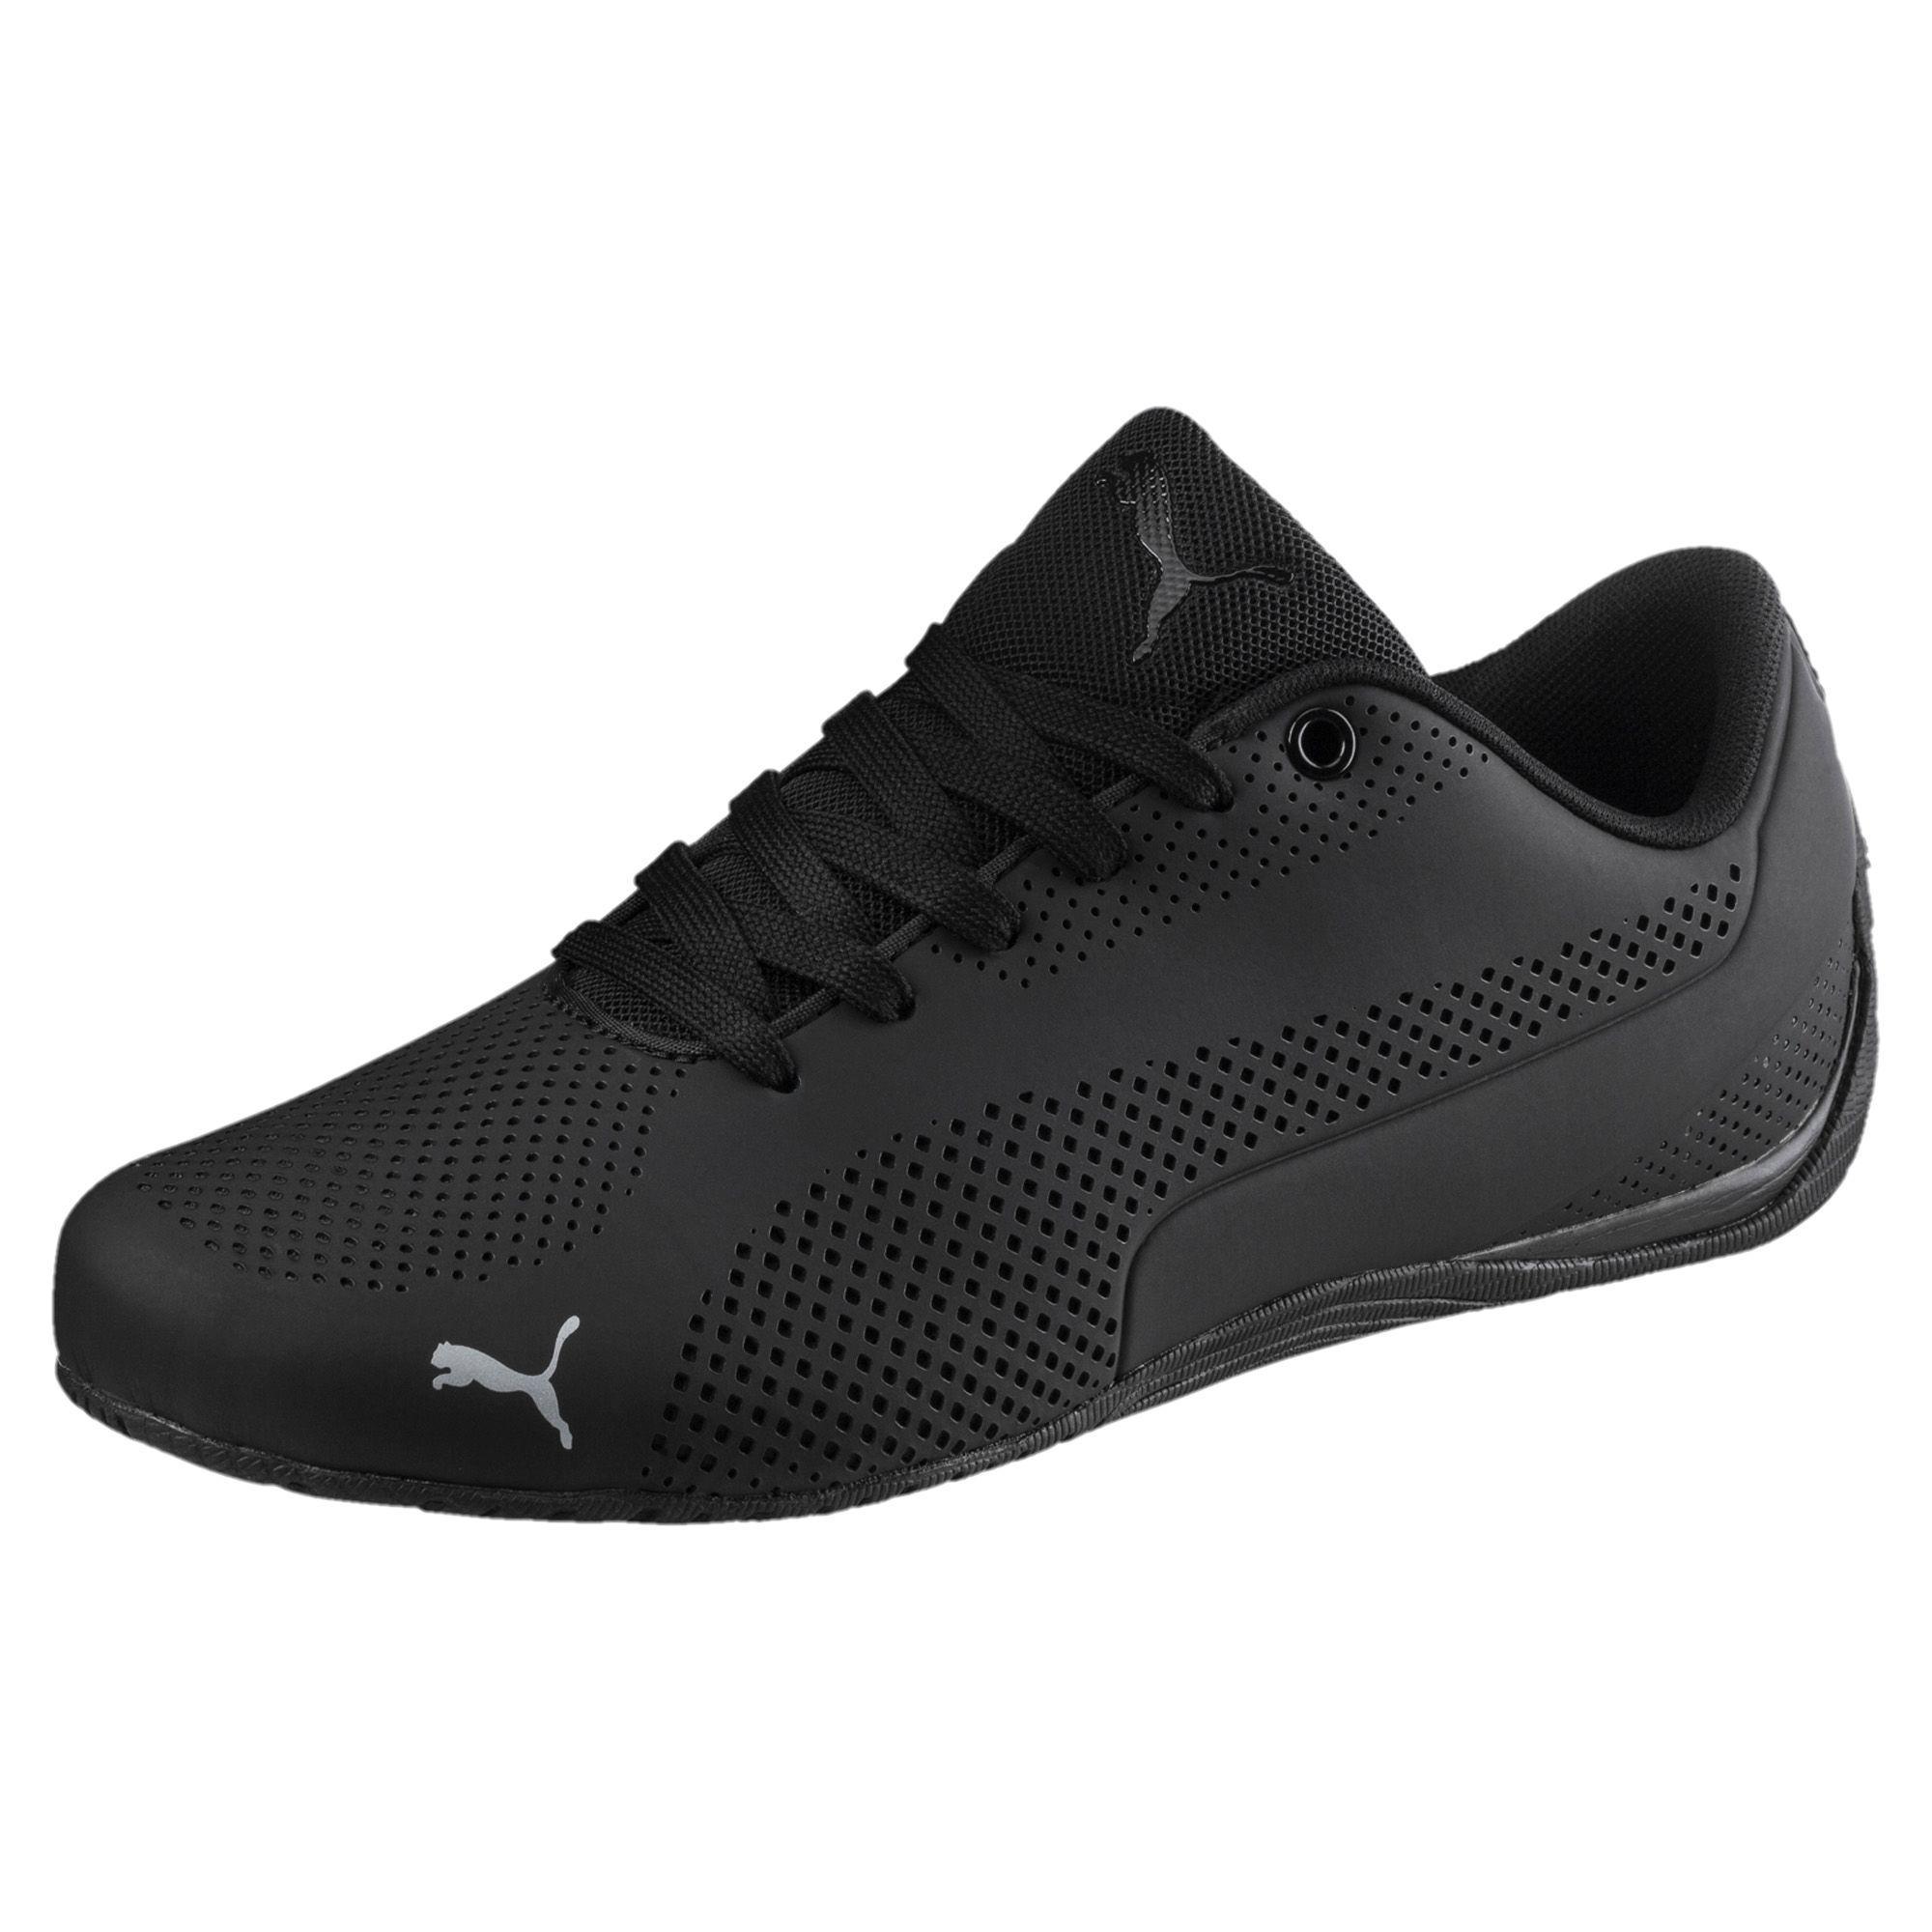 97fbd9d6f8d Lyst - PUMA Drift Cat Ultra Reflective Men s Shoes in Black for Men ...